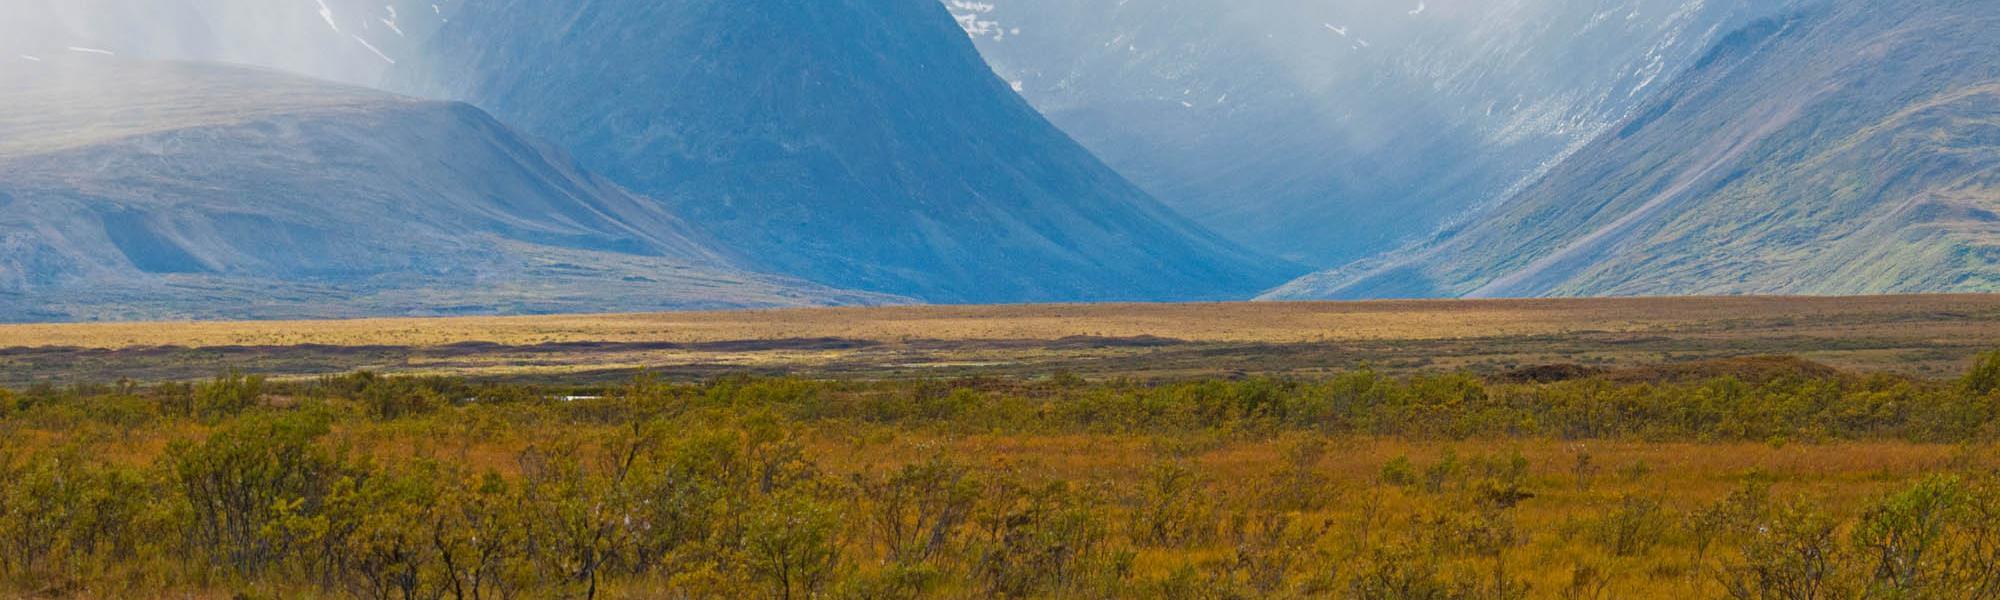 Mackenzie Mountains